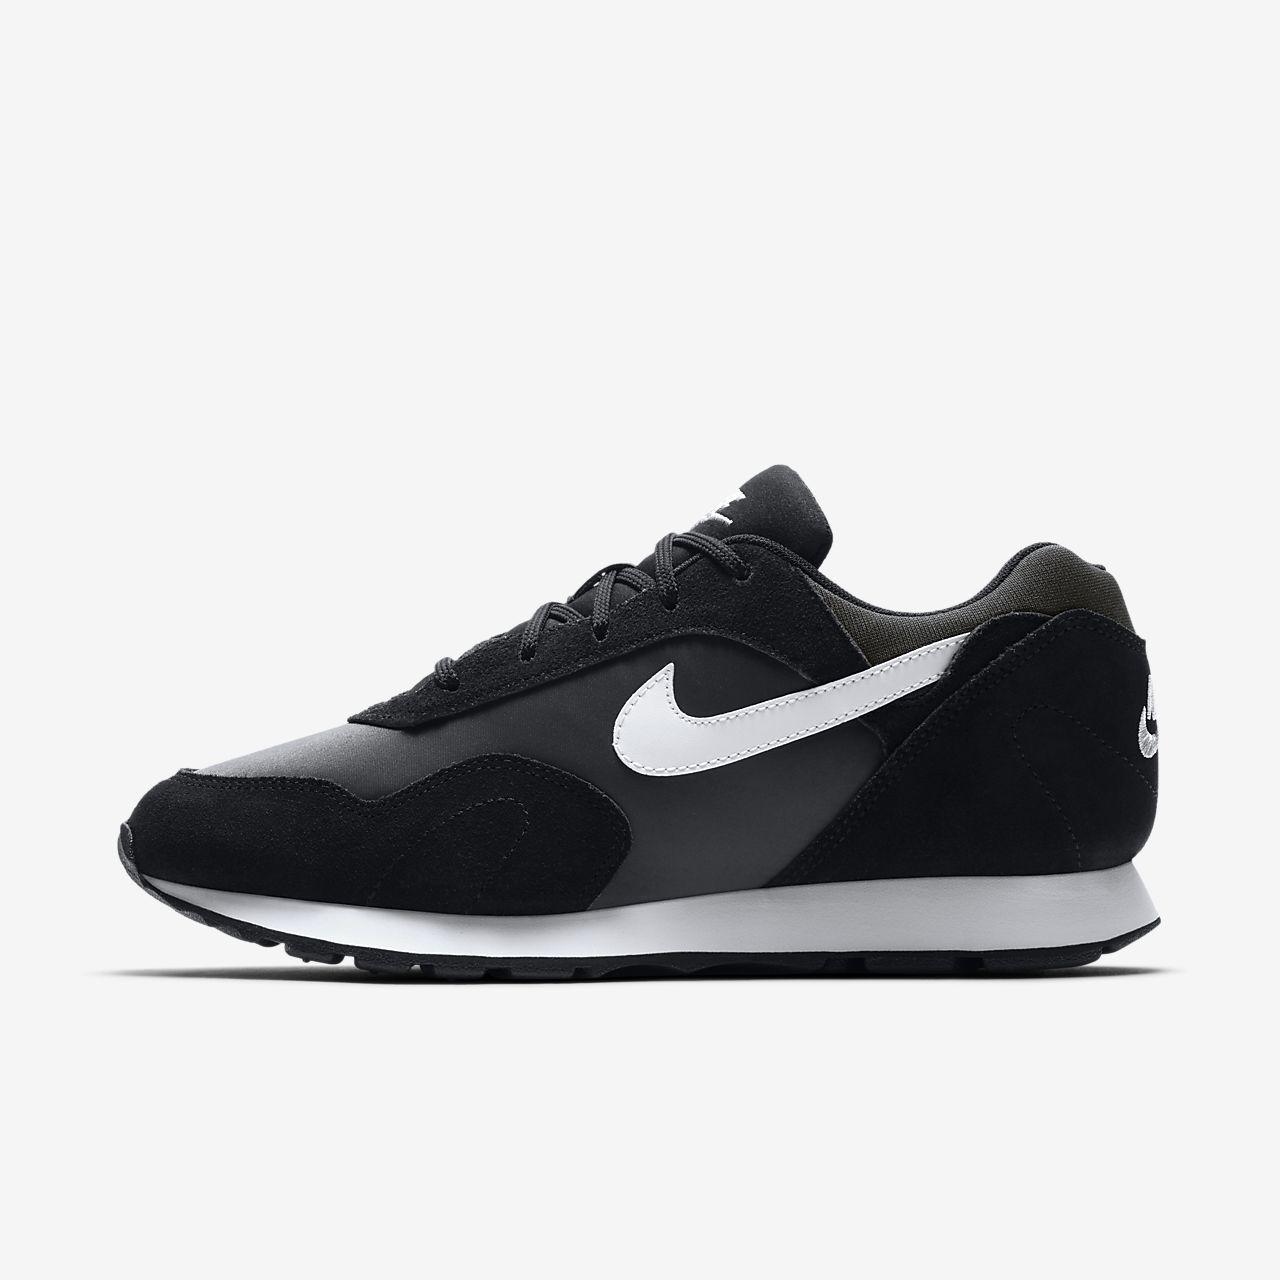 Nike Outburst-sko til kvinder